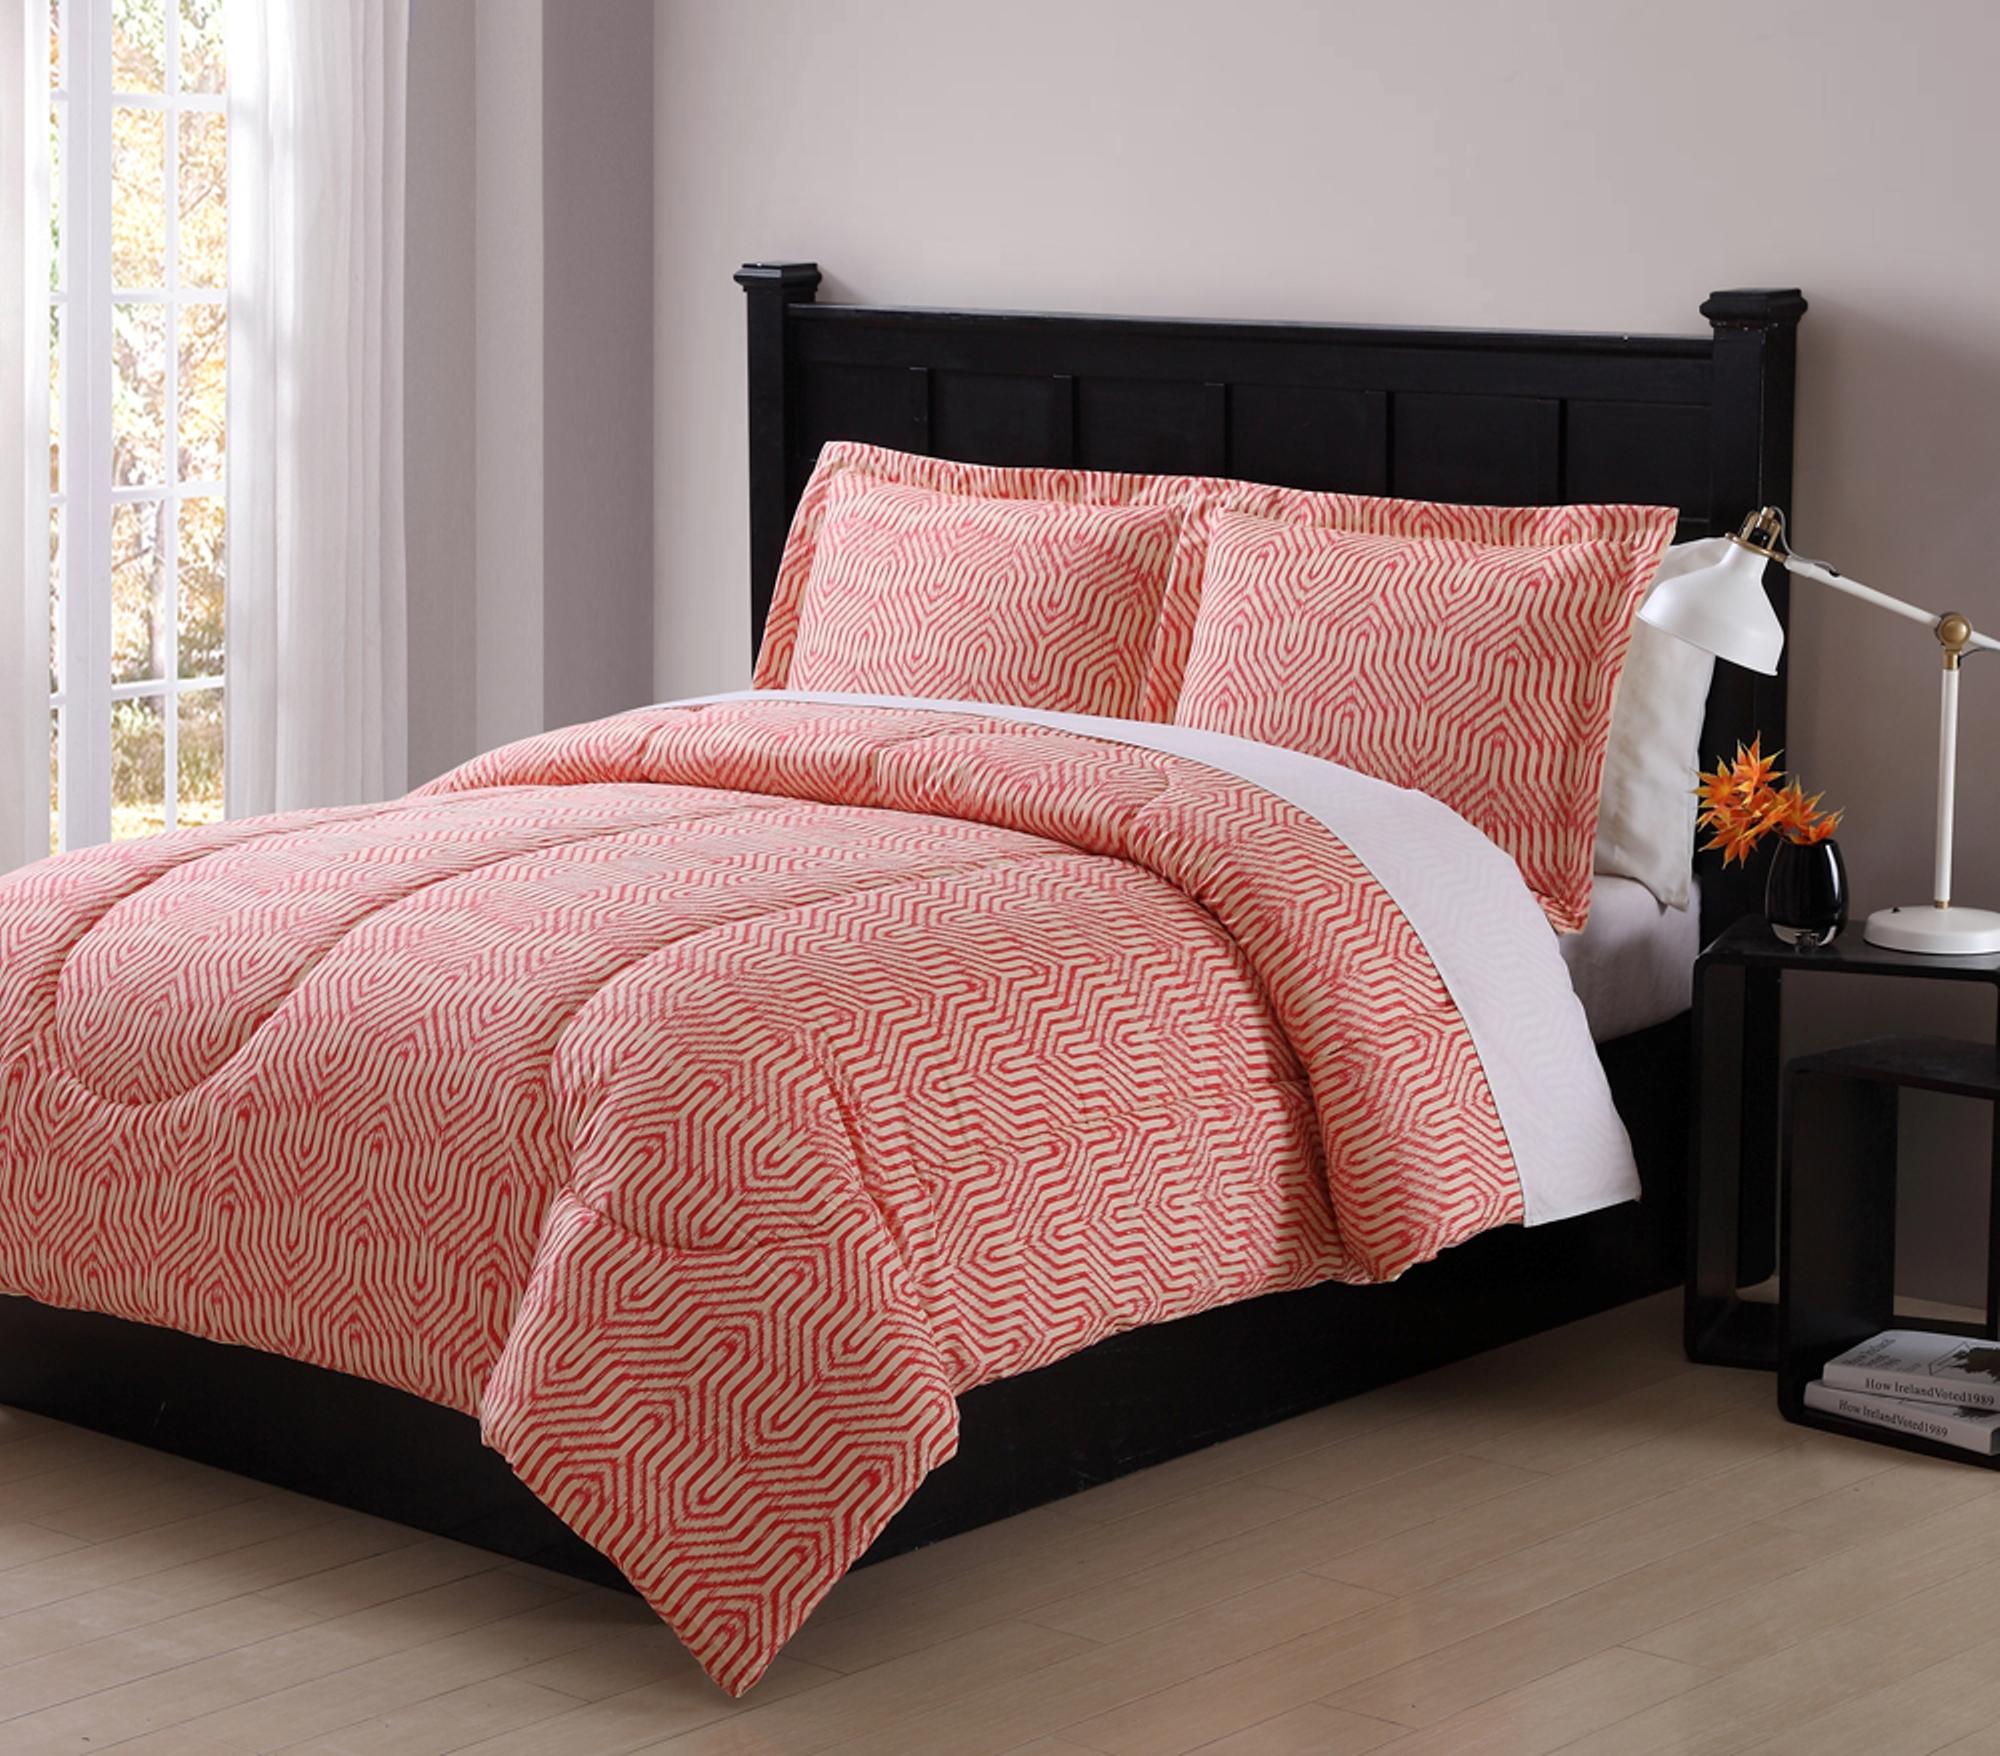 Colormate Coral Ikat Comforter Set Home Bed Amp Bath